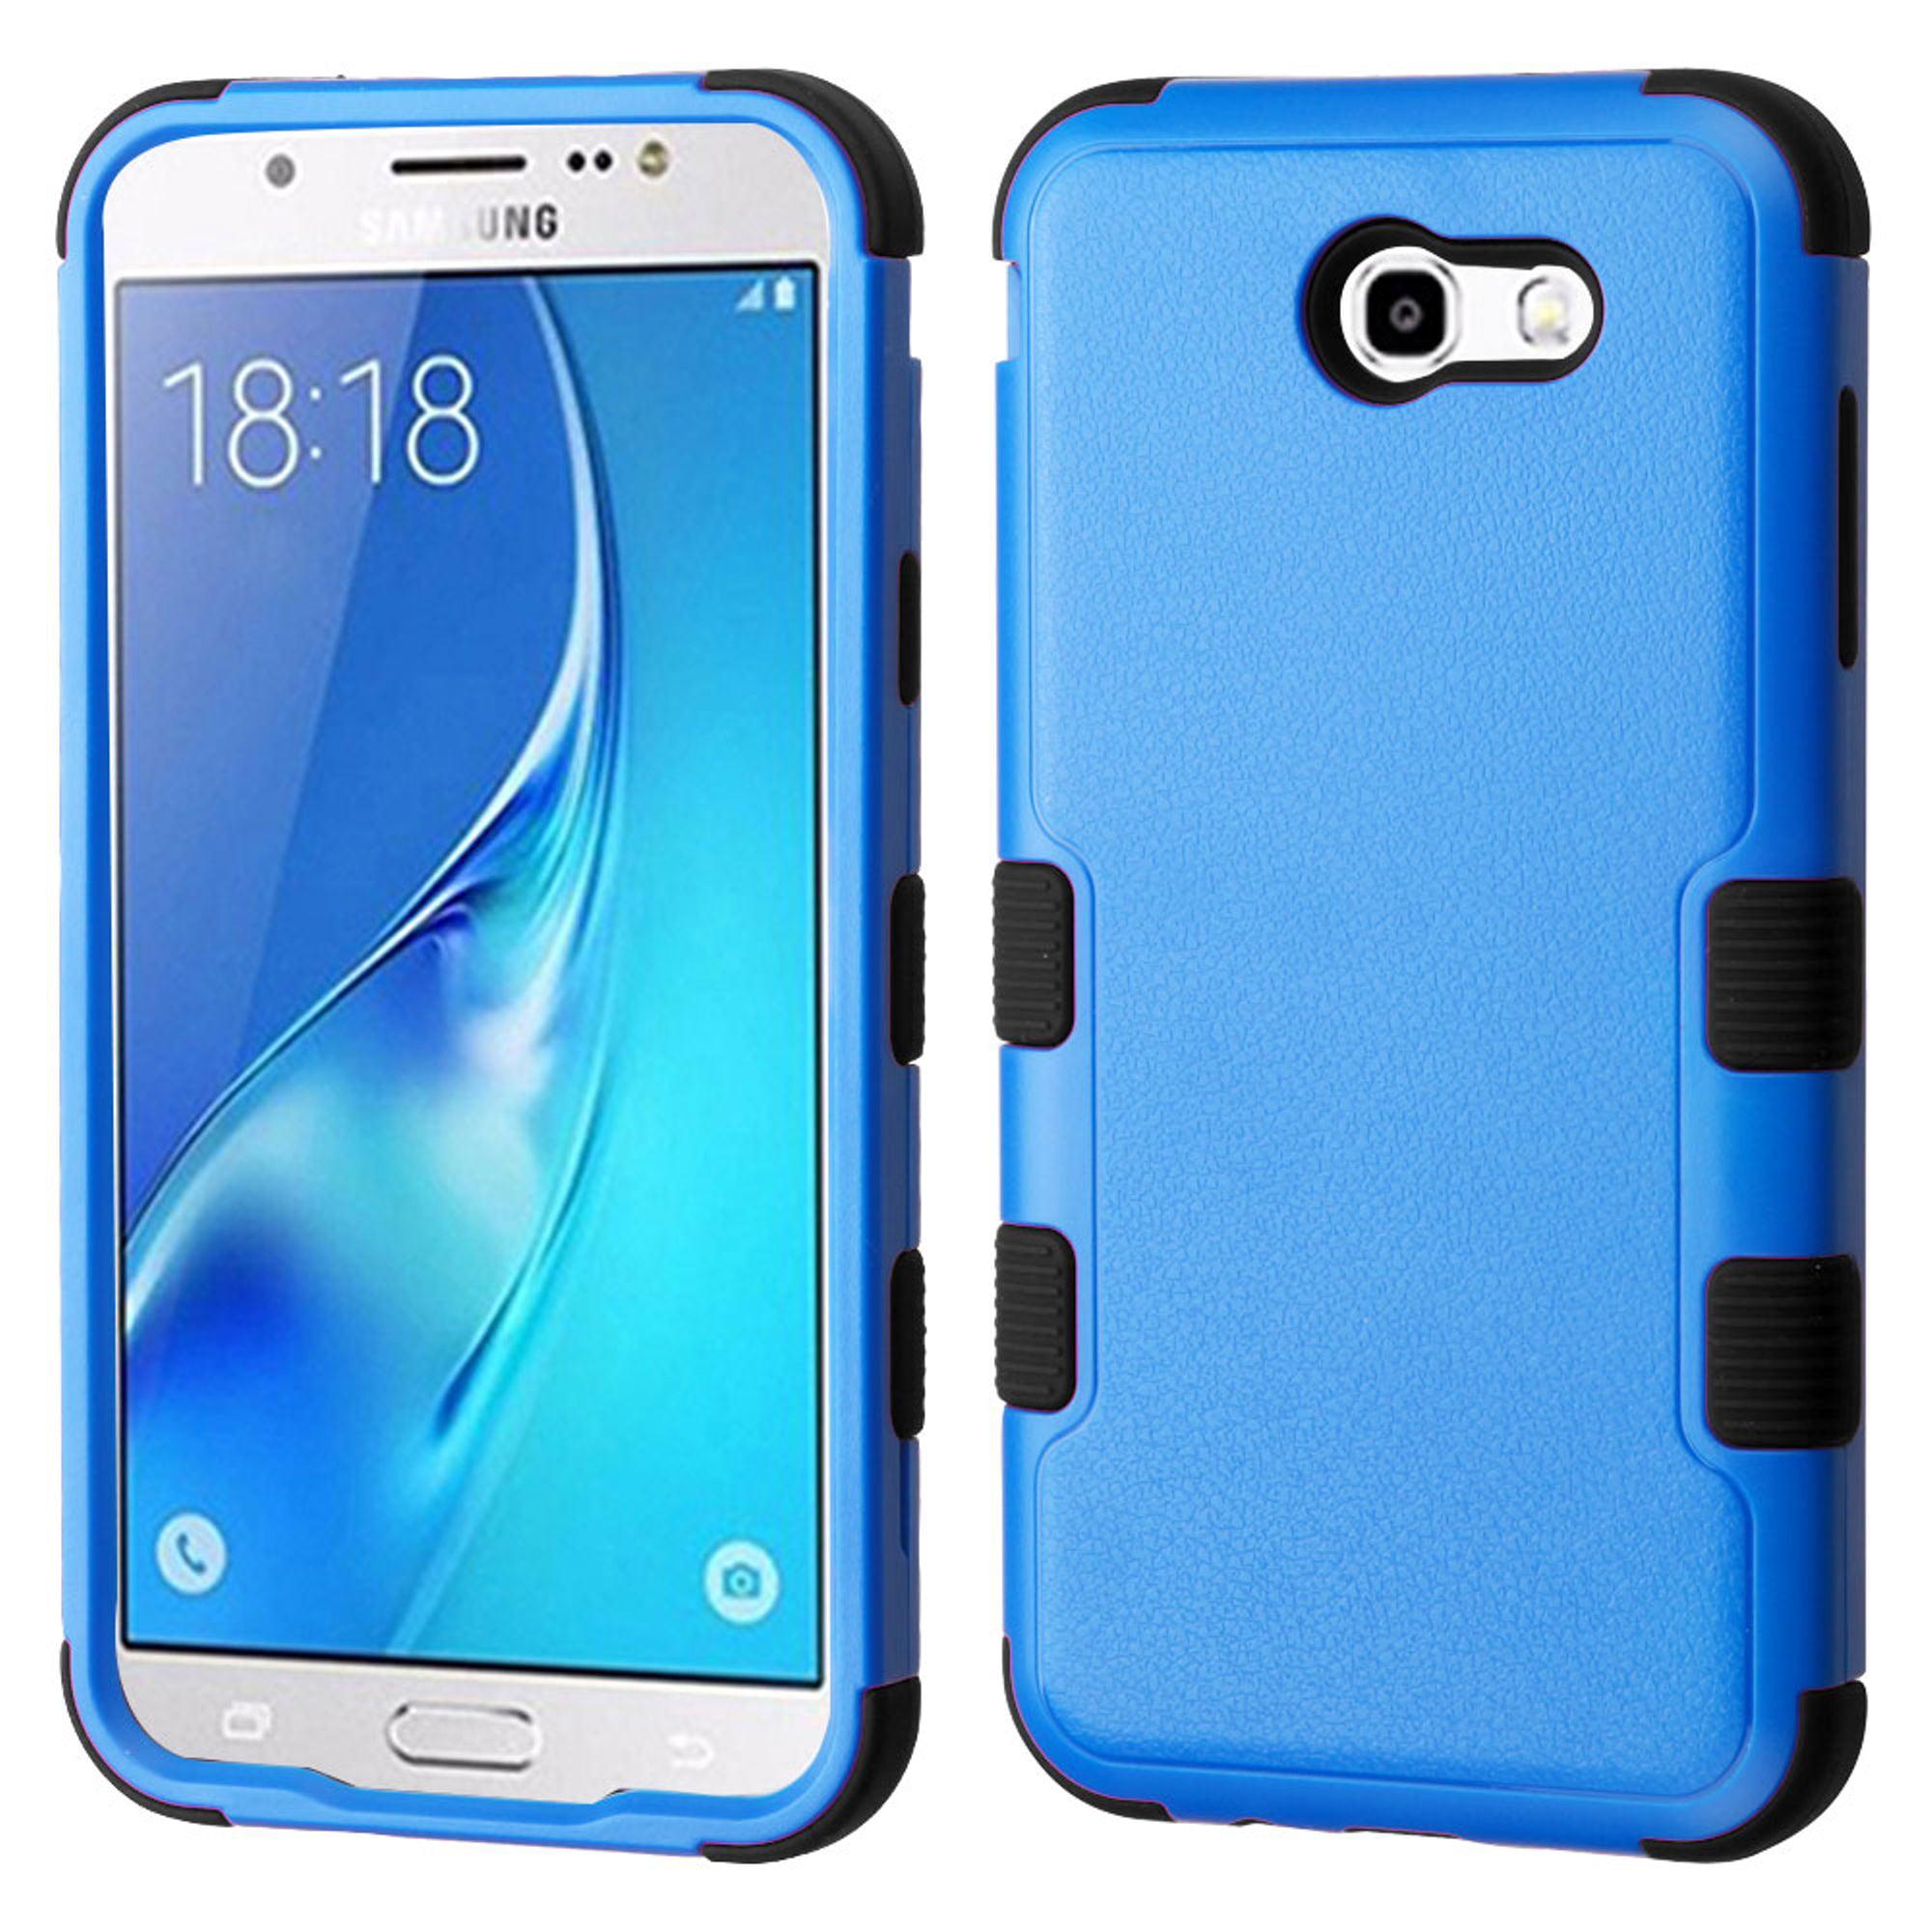 Samsung Galaxy J7 2017 phone case, Samsung Galaxy J7 Perx case, by Insten TUFF Shock Absorbing Hybrid PC/TPU Dual Layer Case For Samsung Galaxy J7 (2017) J7 Perx J7 Sky Pro J7 V